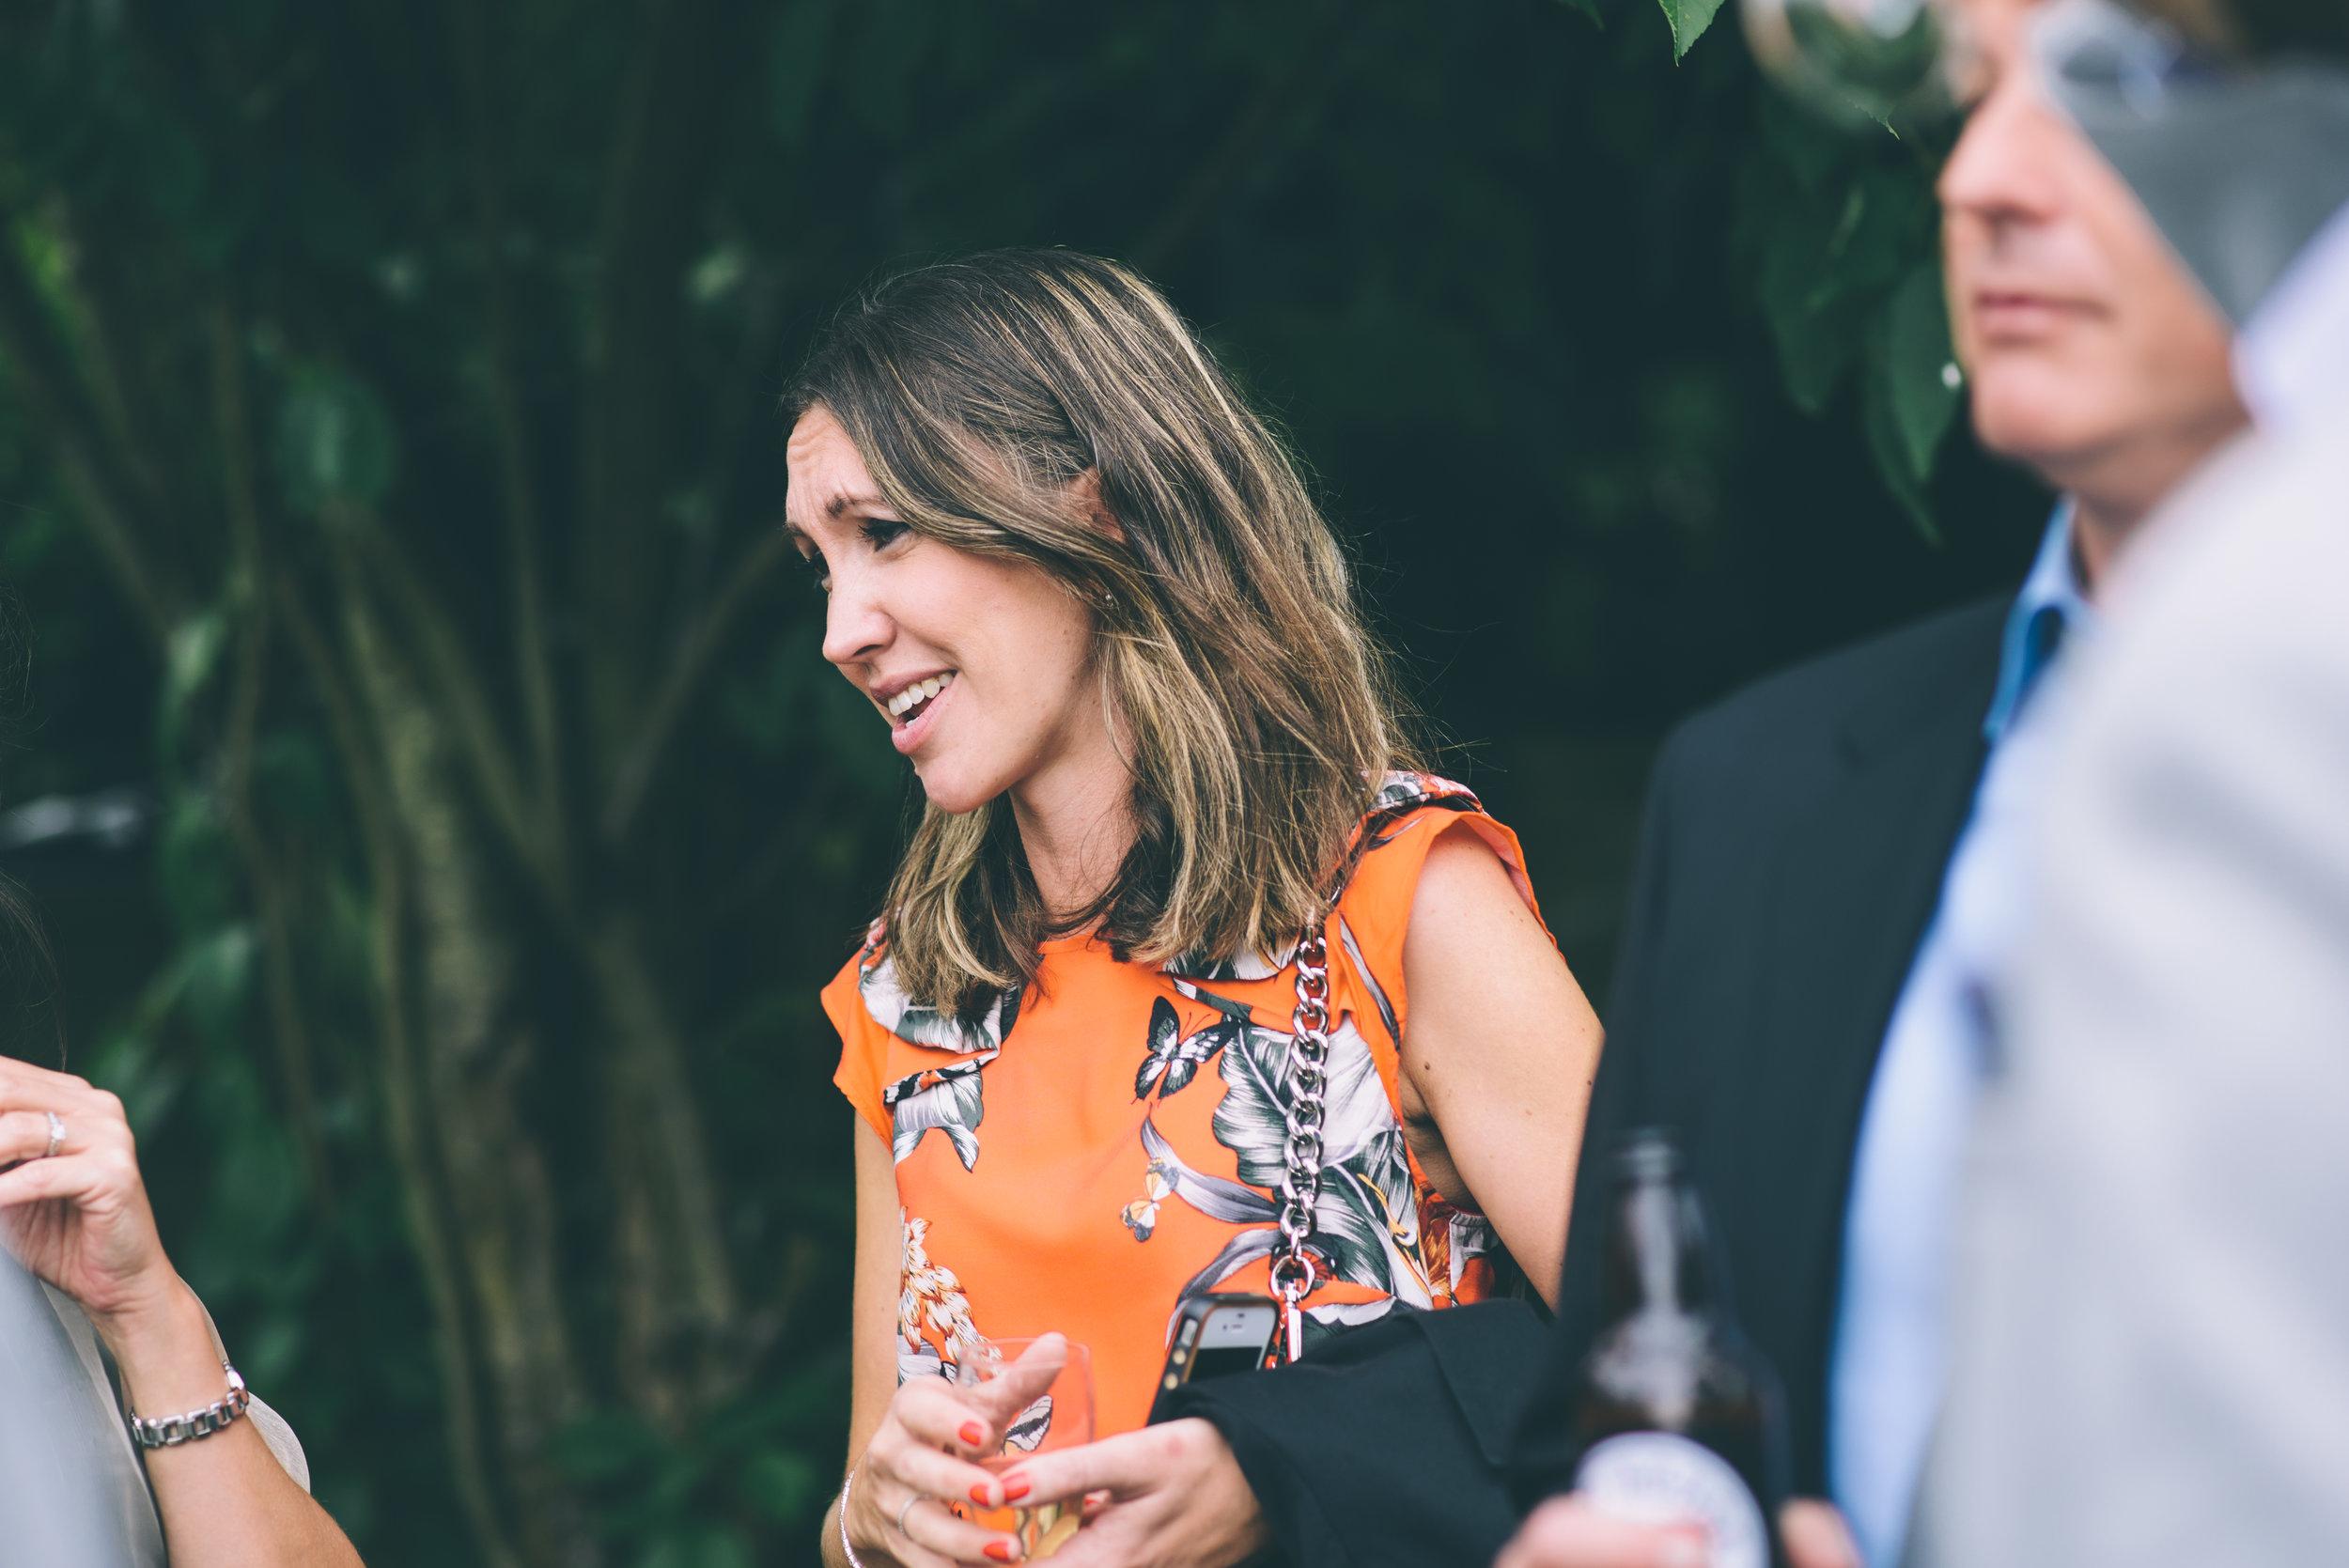 Garden Wedding photography Barley Herefordshire - Tracy + Matt -261.jpg